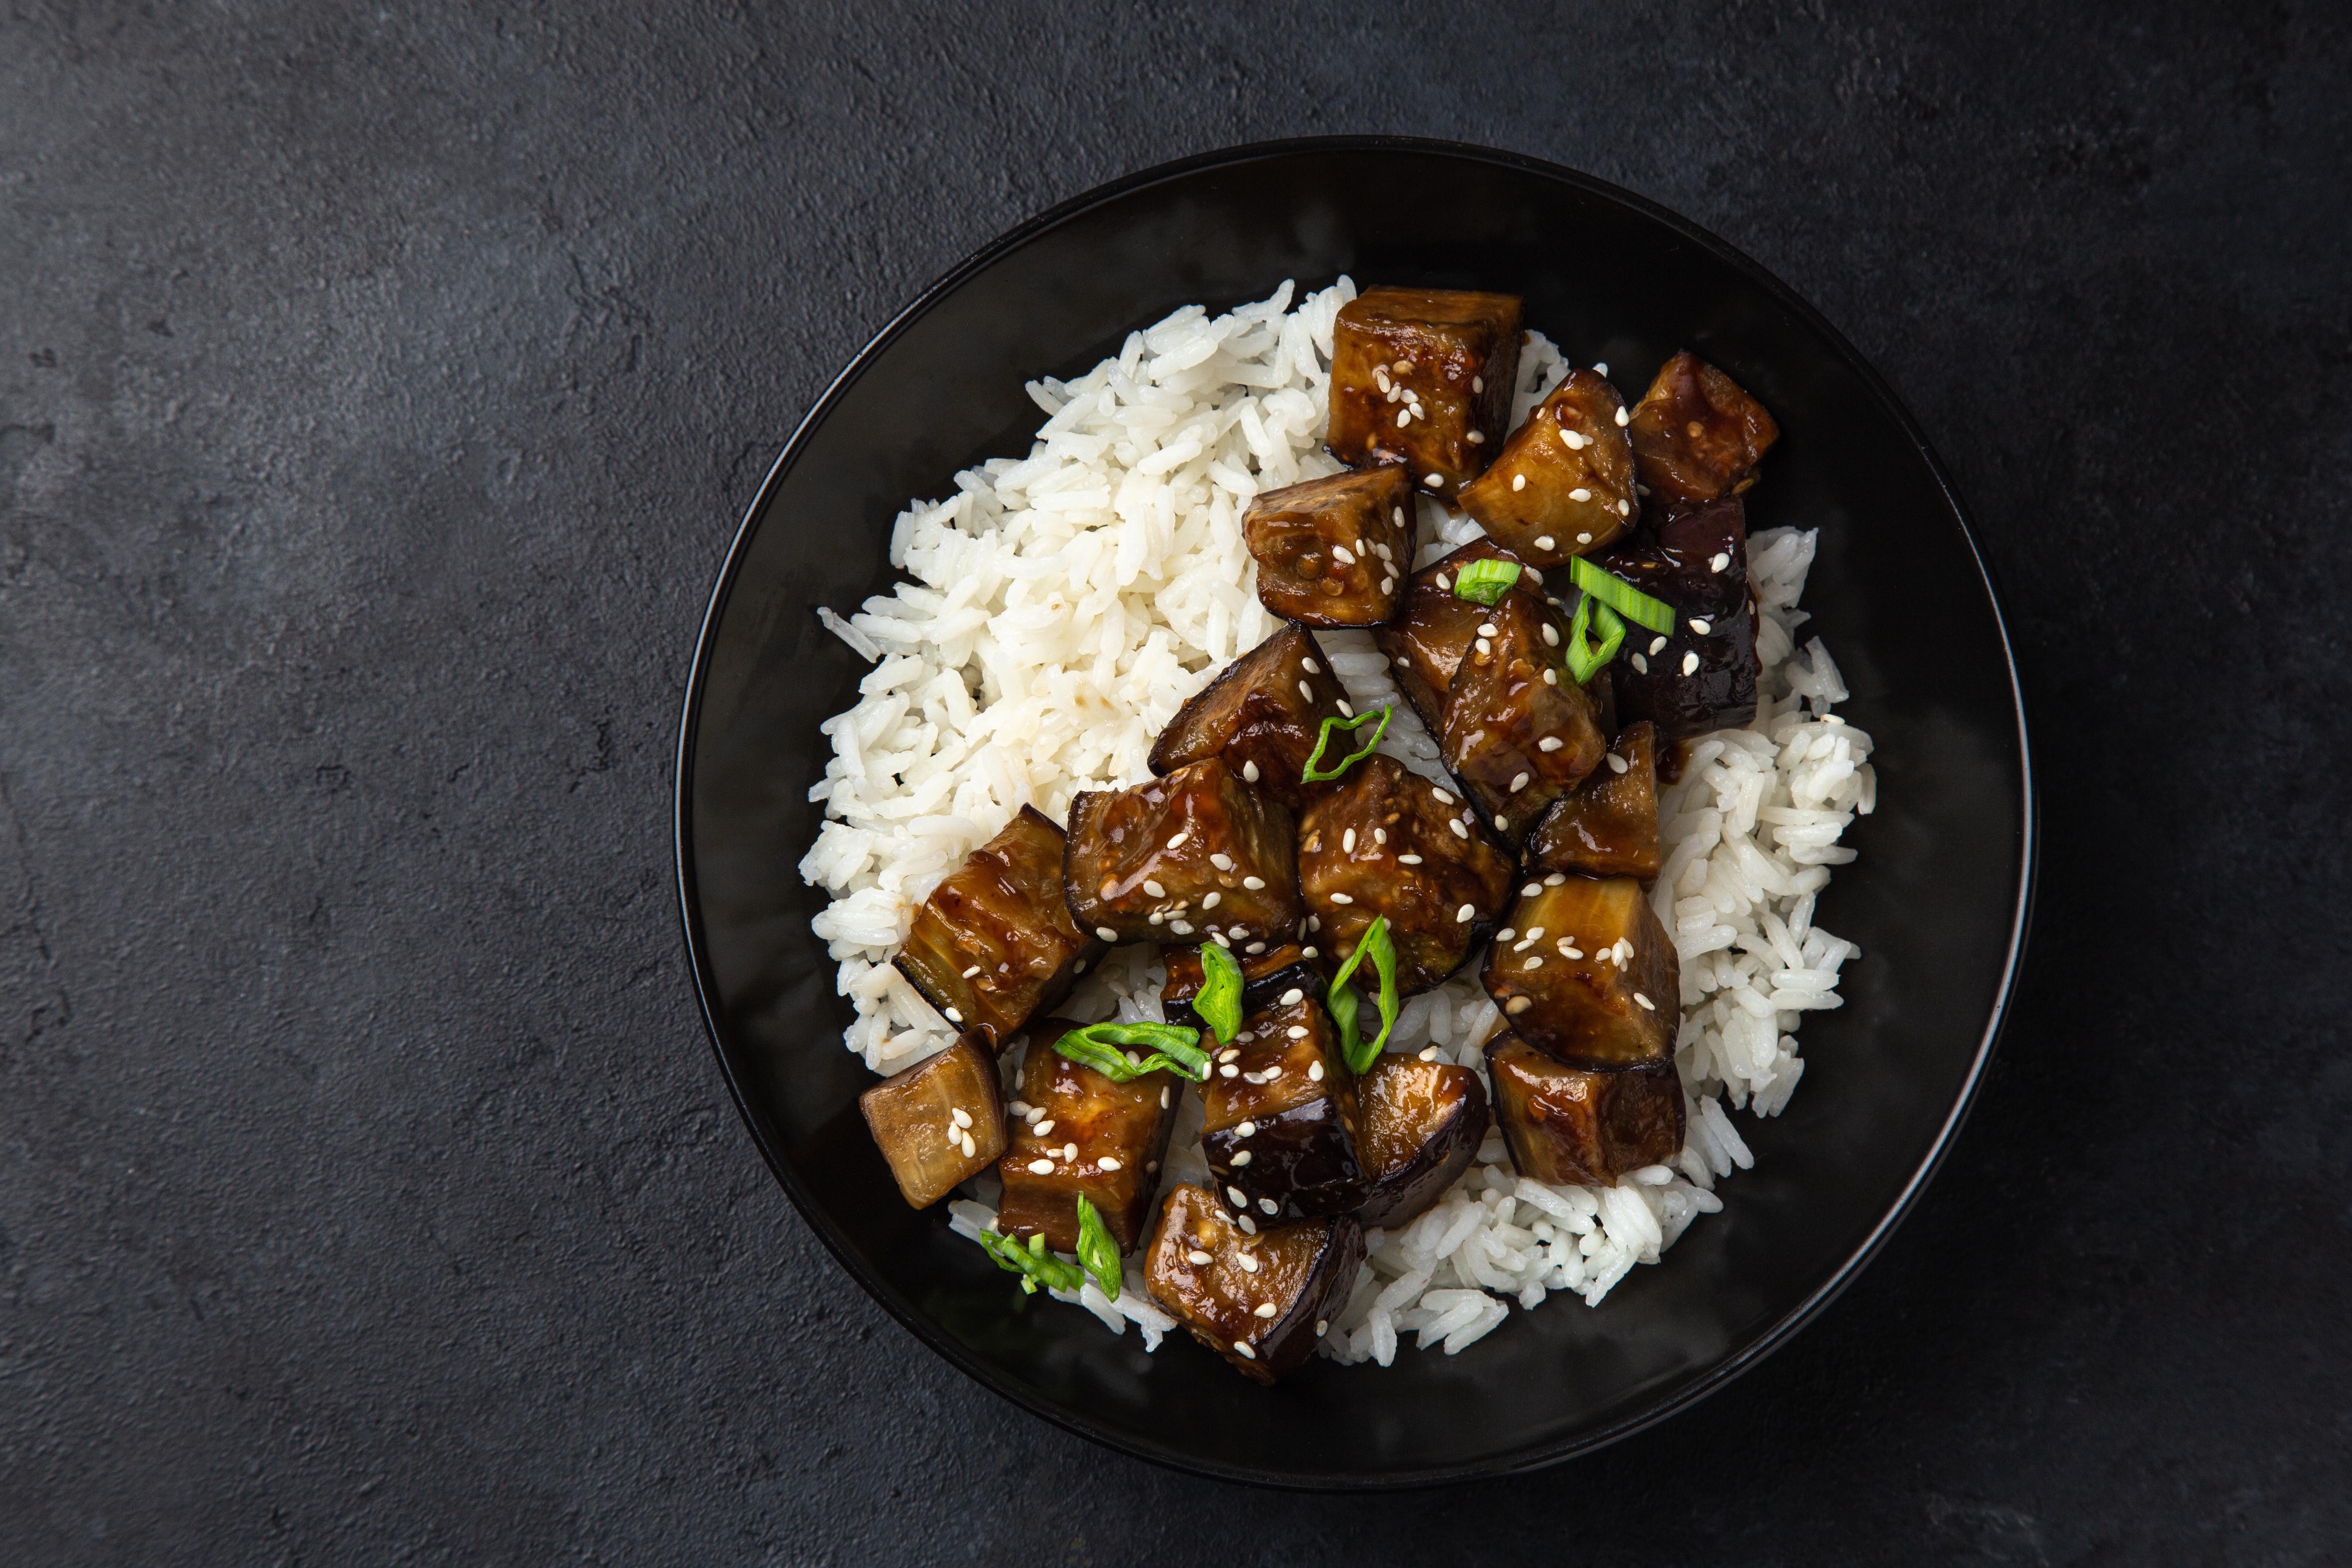 aubergine teriyaki bowl with rice